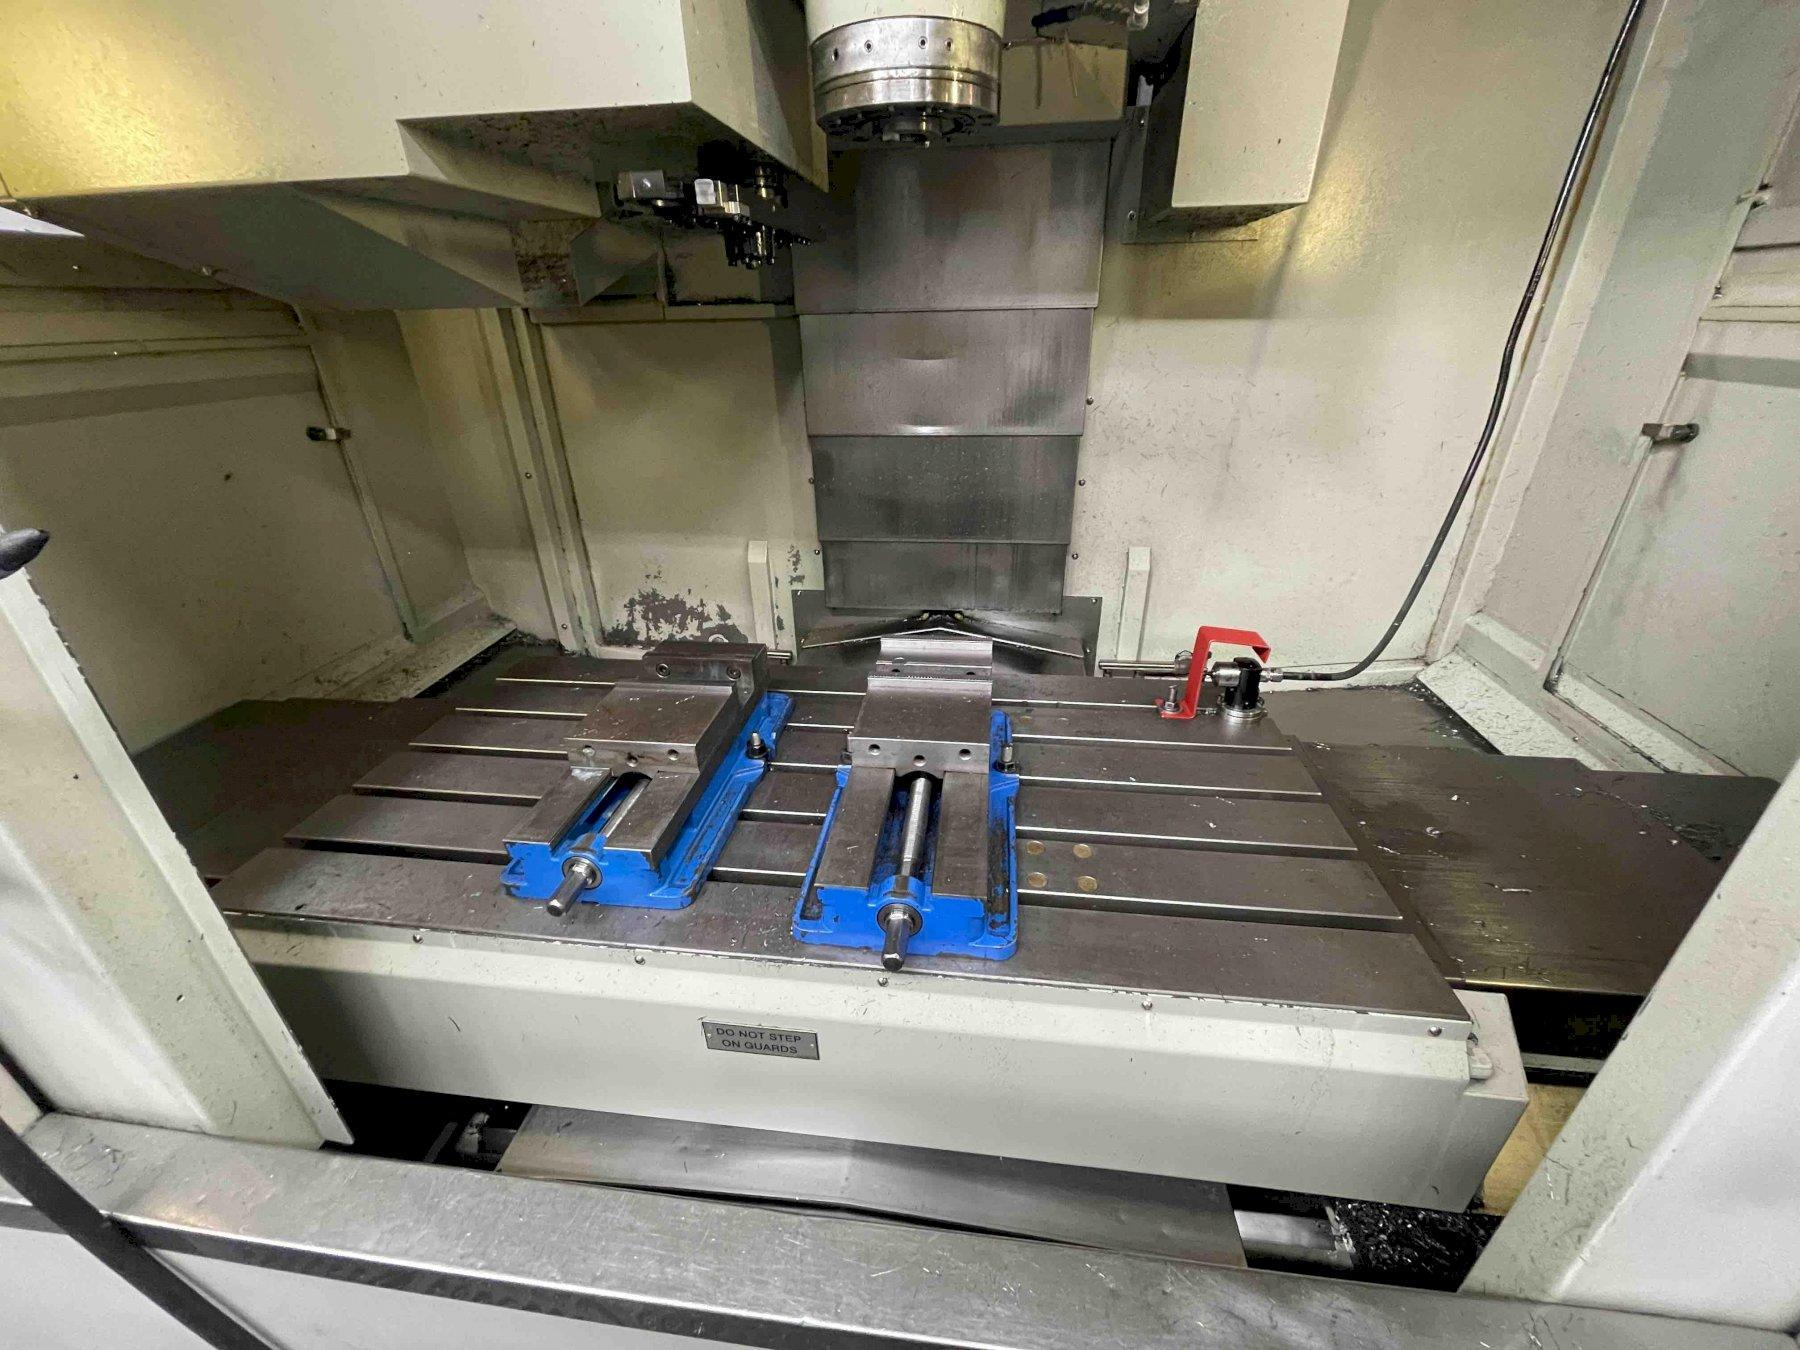 "HARDINGE GX-1000 CNC VERTICAL MACHINING CENTER, Fanuc 18i-MB CNC Control, 44"" x 21"" Table, X=40"", Y=21"", Z=21"", 40 Taper, 10,000 RPM, New 2006."